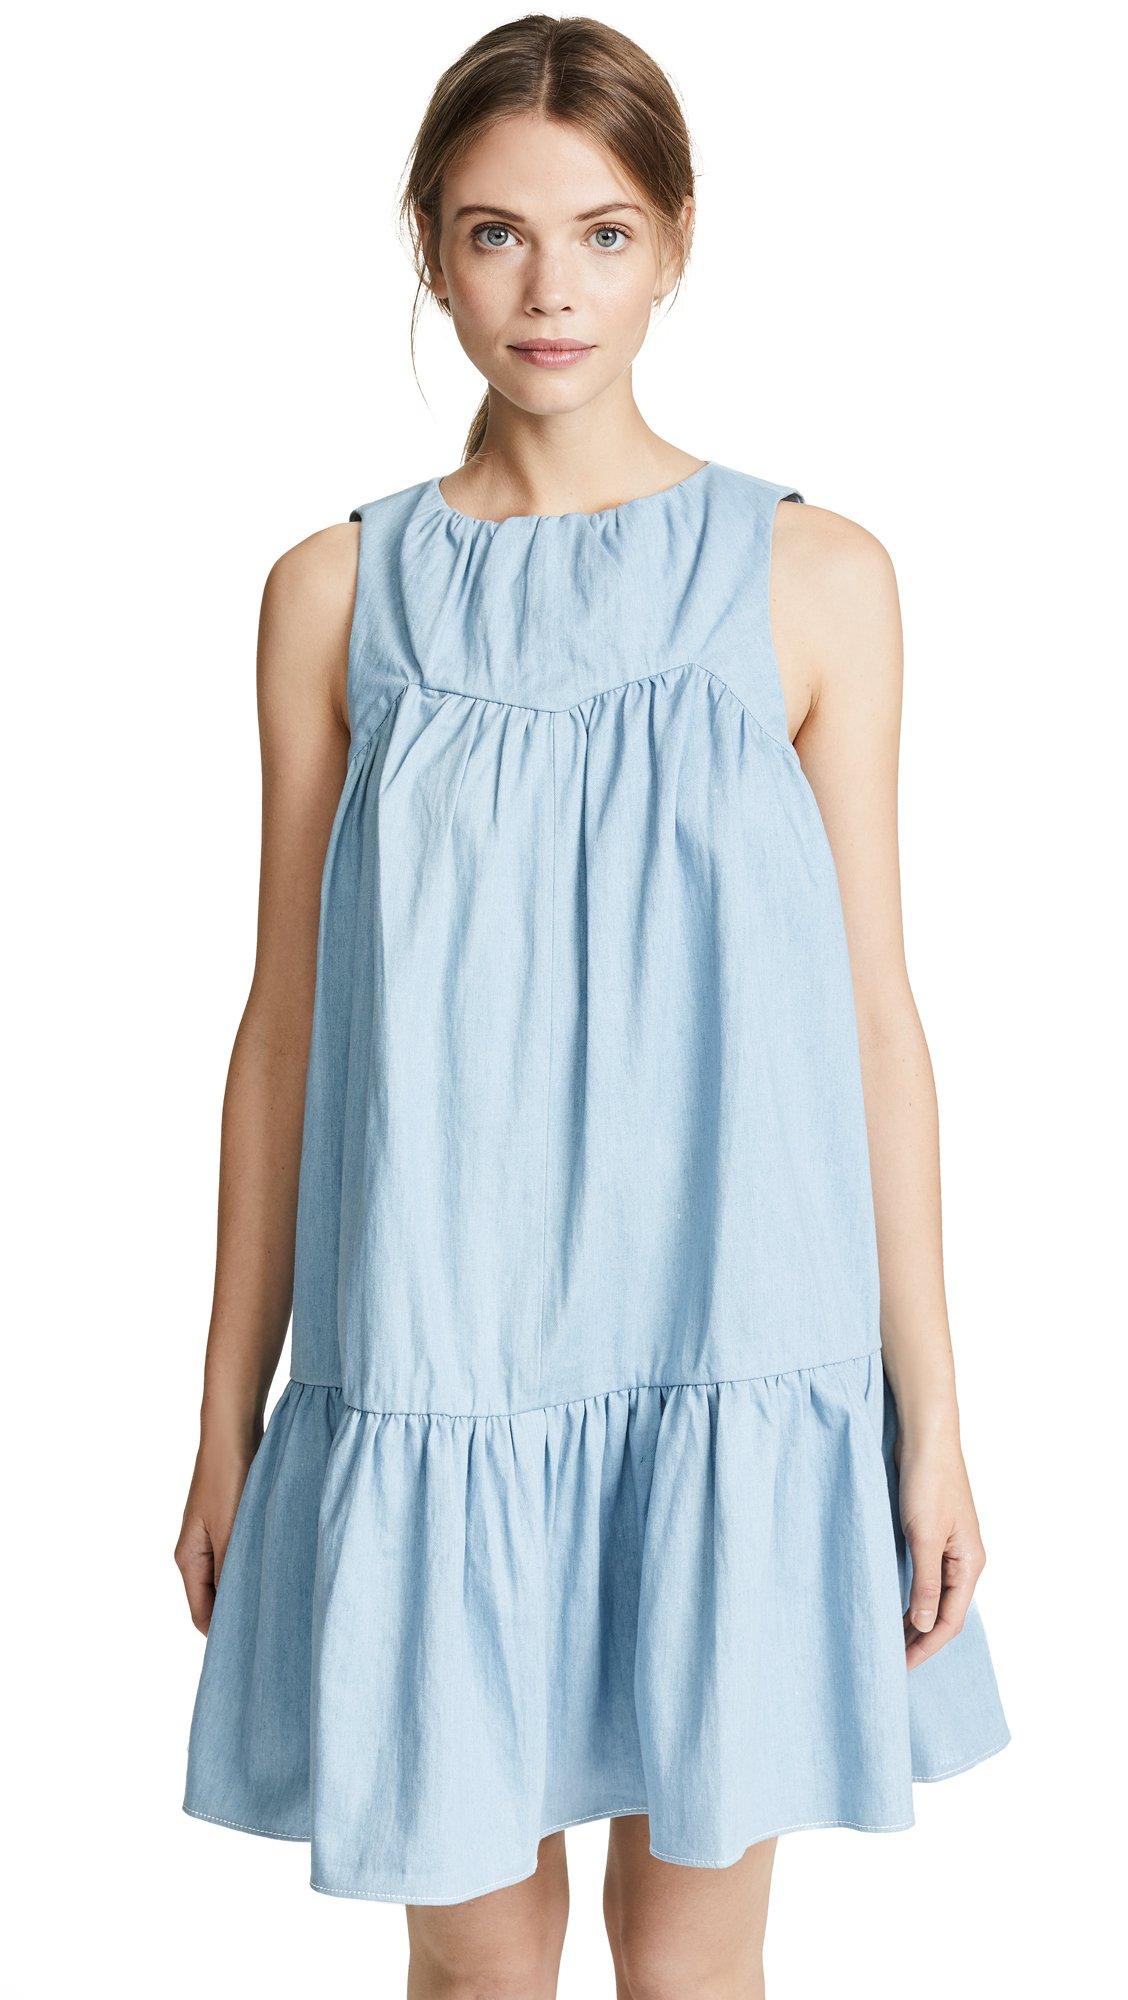 PAPER London Women's Dolce Denim Dress, Light Wash, 14